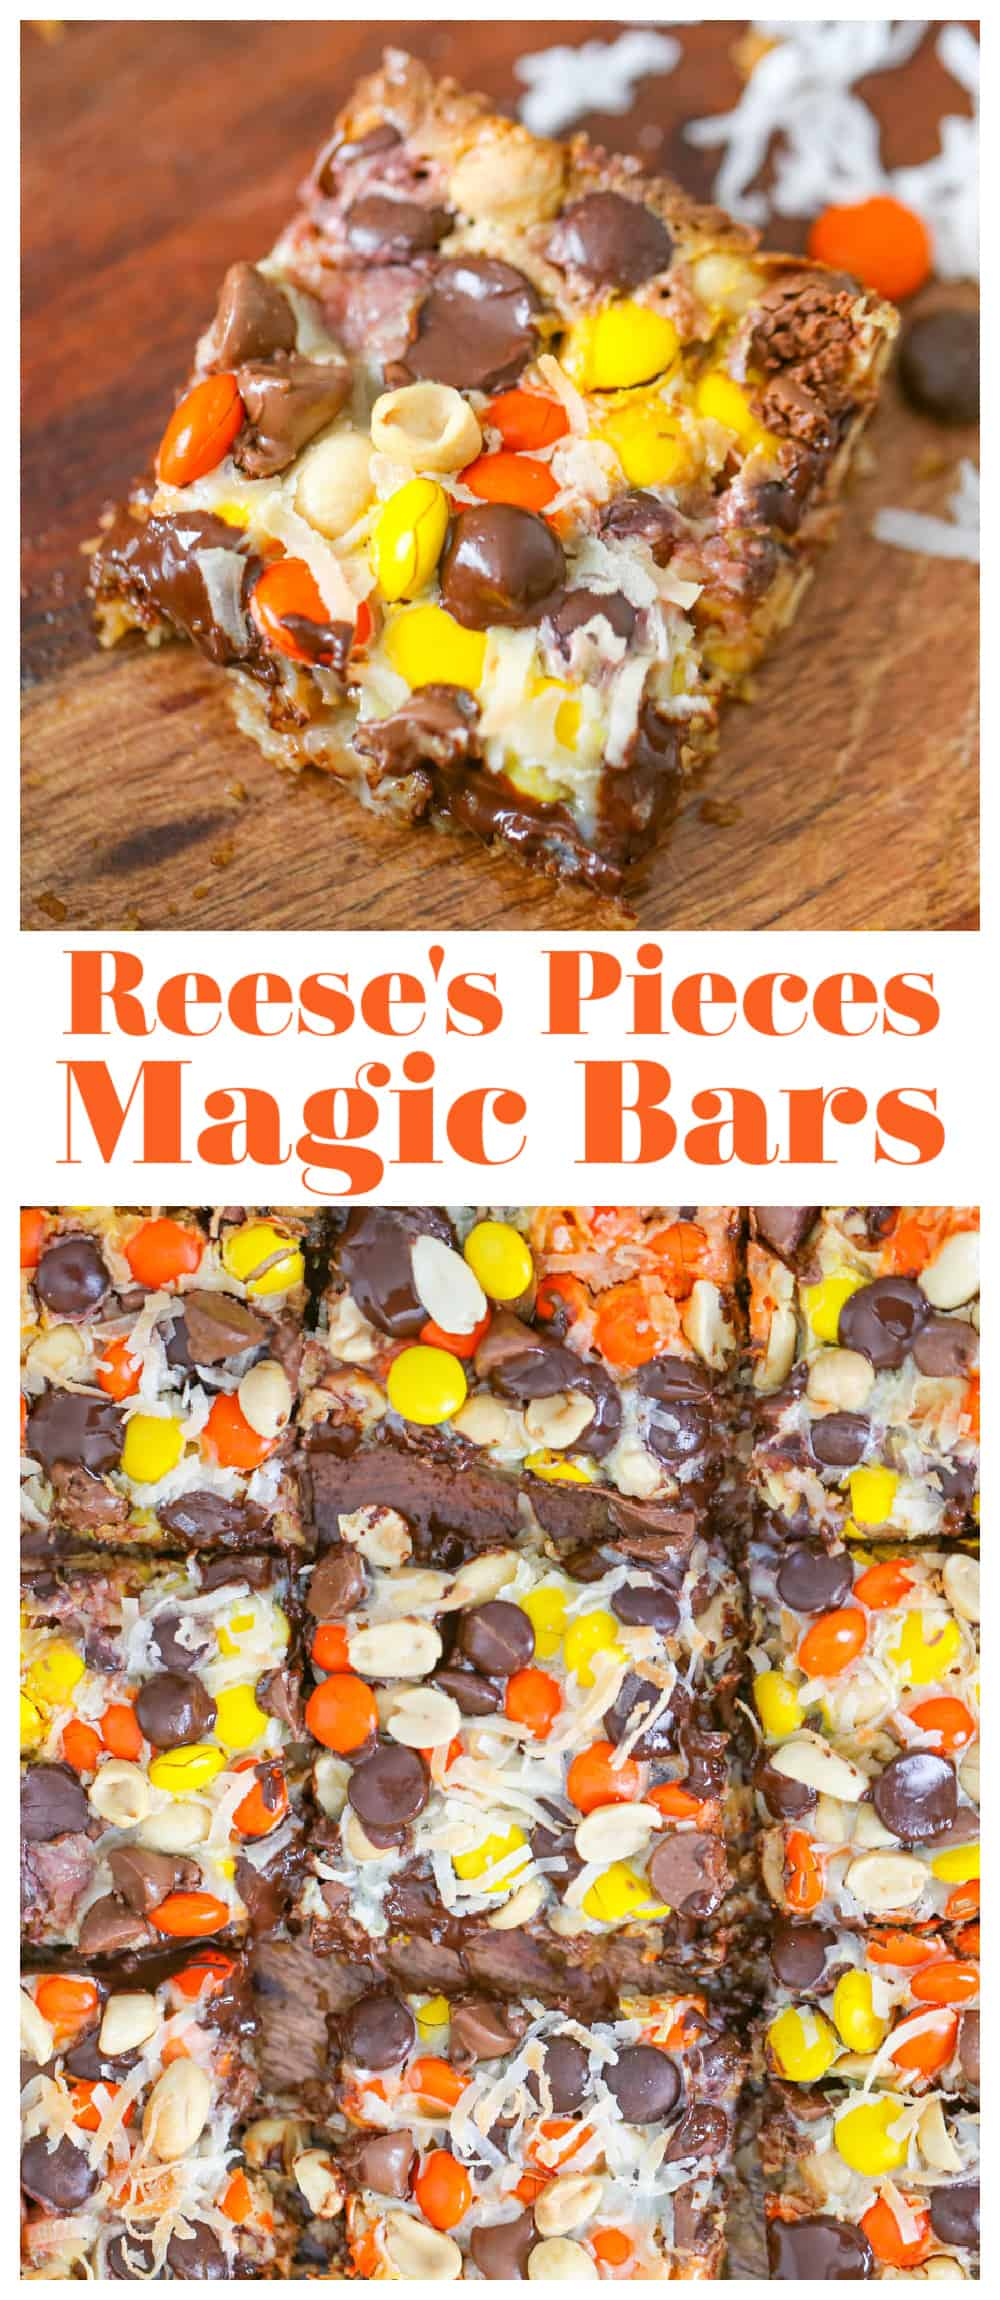 Reese's Pieces Magic Bars